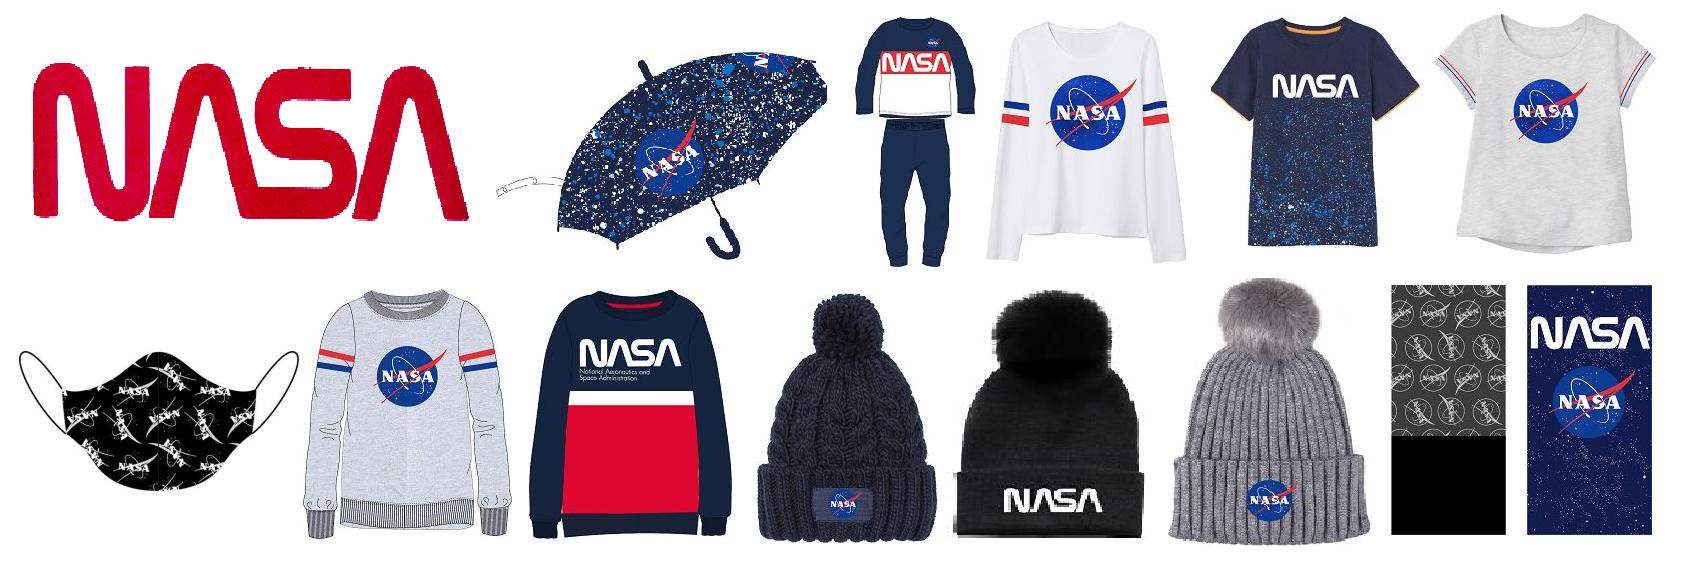 Nasa wholesaler apparel